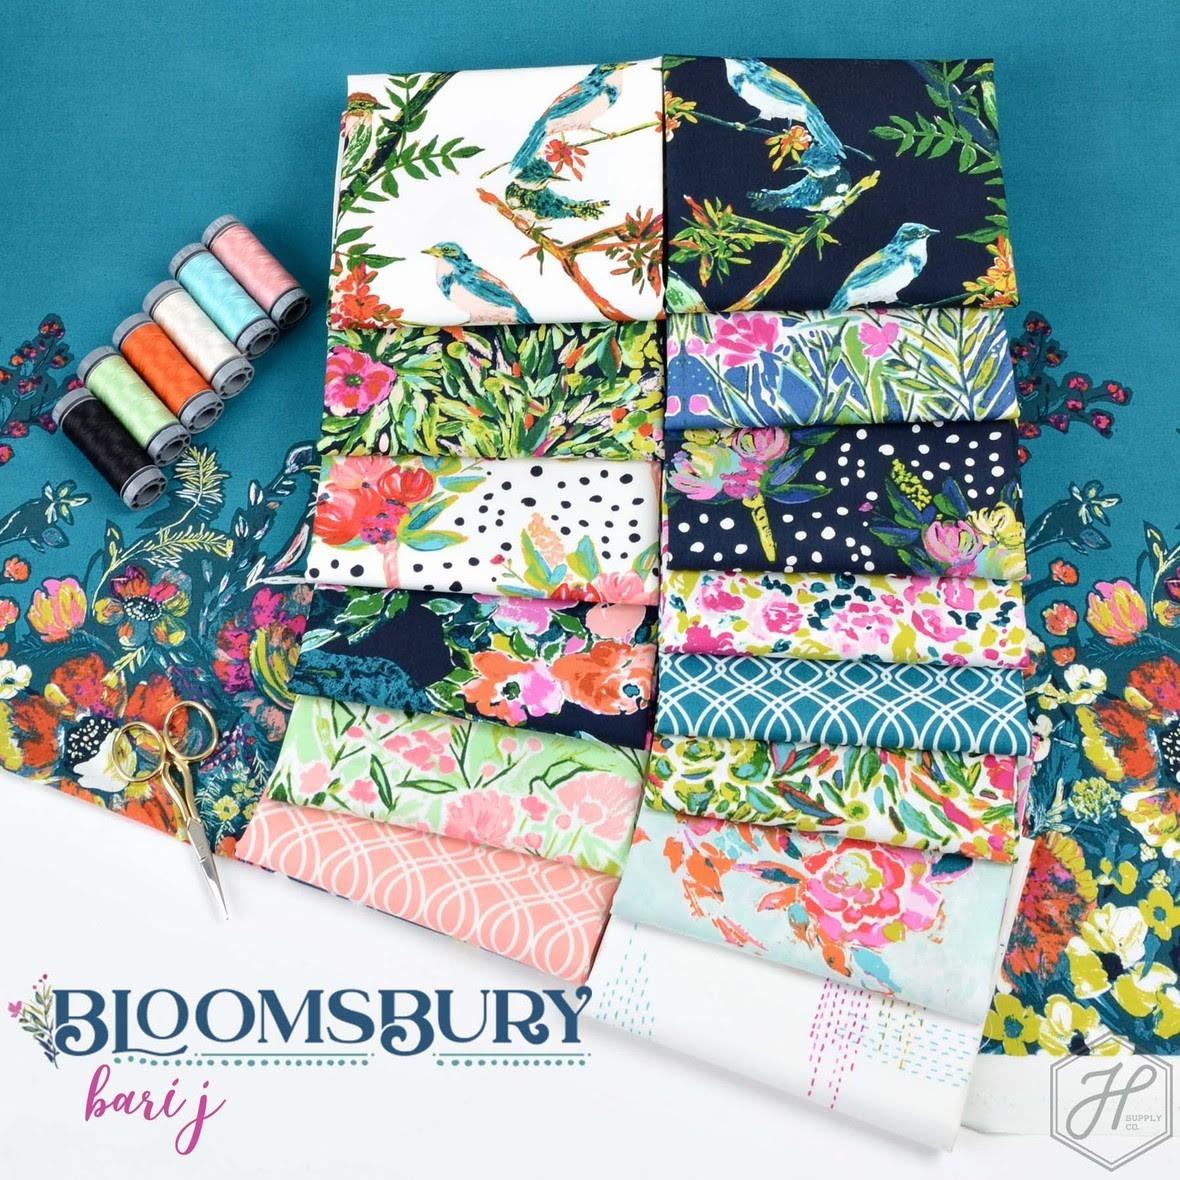 Bloomsbury art gallery fabric bari jhawthorne